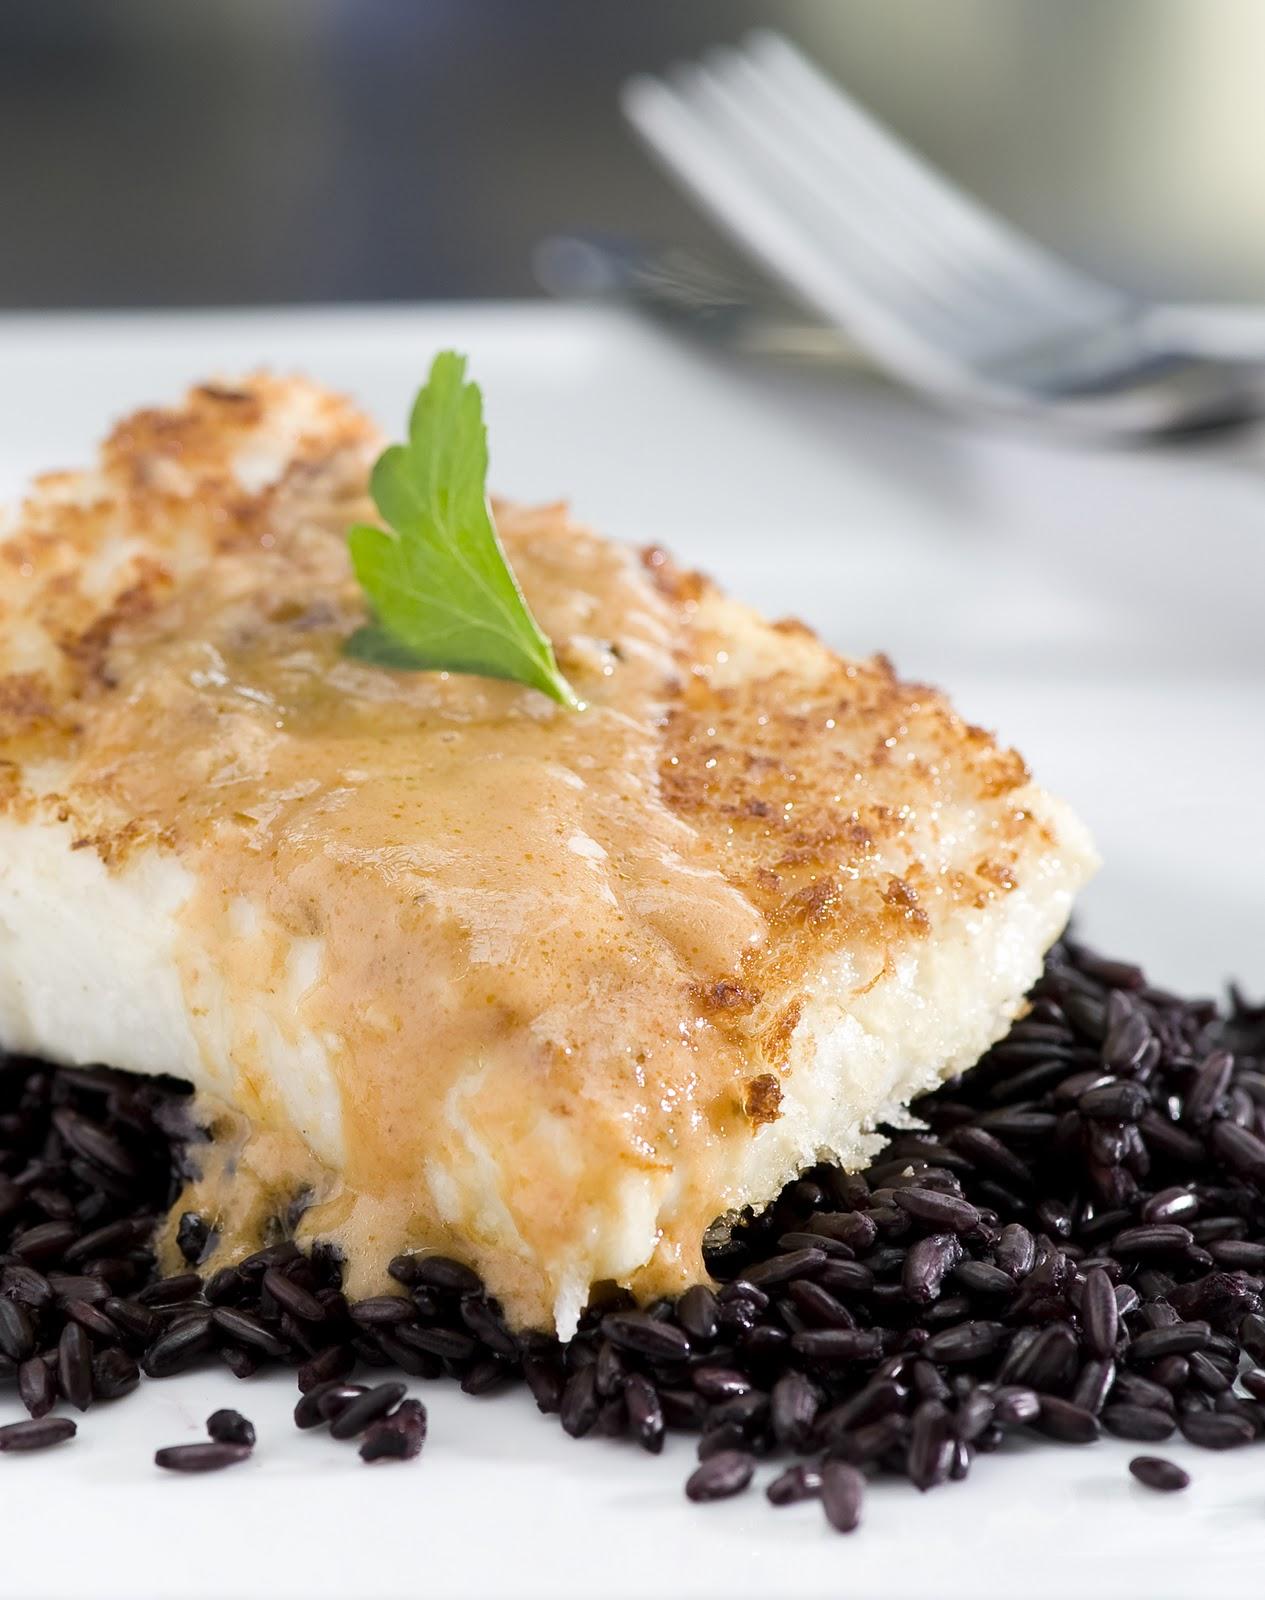 ... fried fish style creamy fried potatoes fish pie fish pie fish tacos